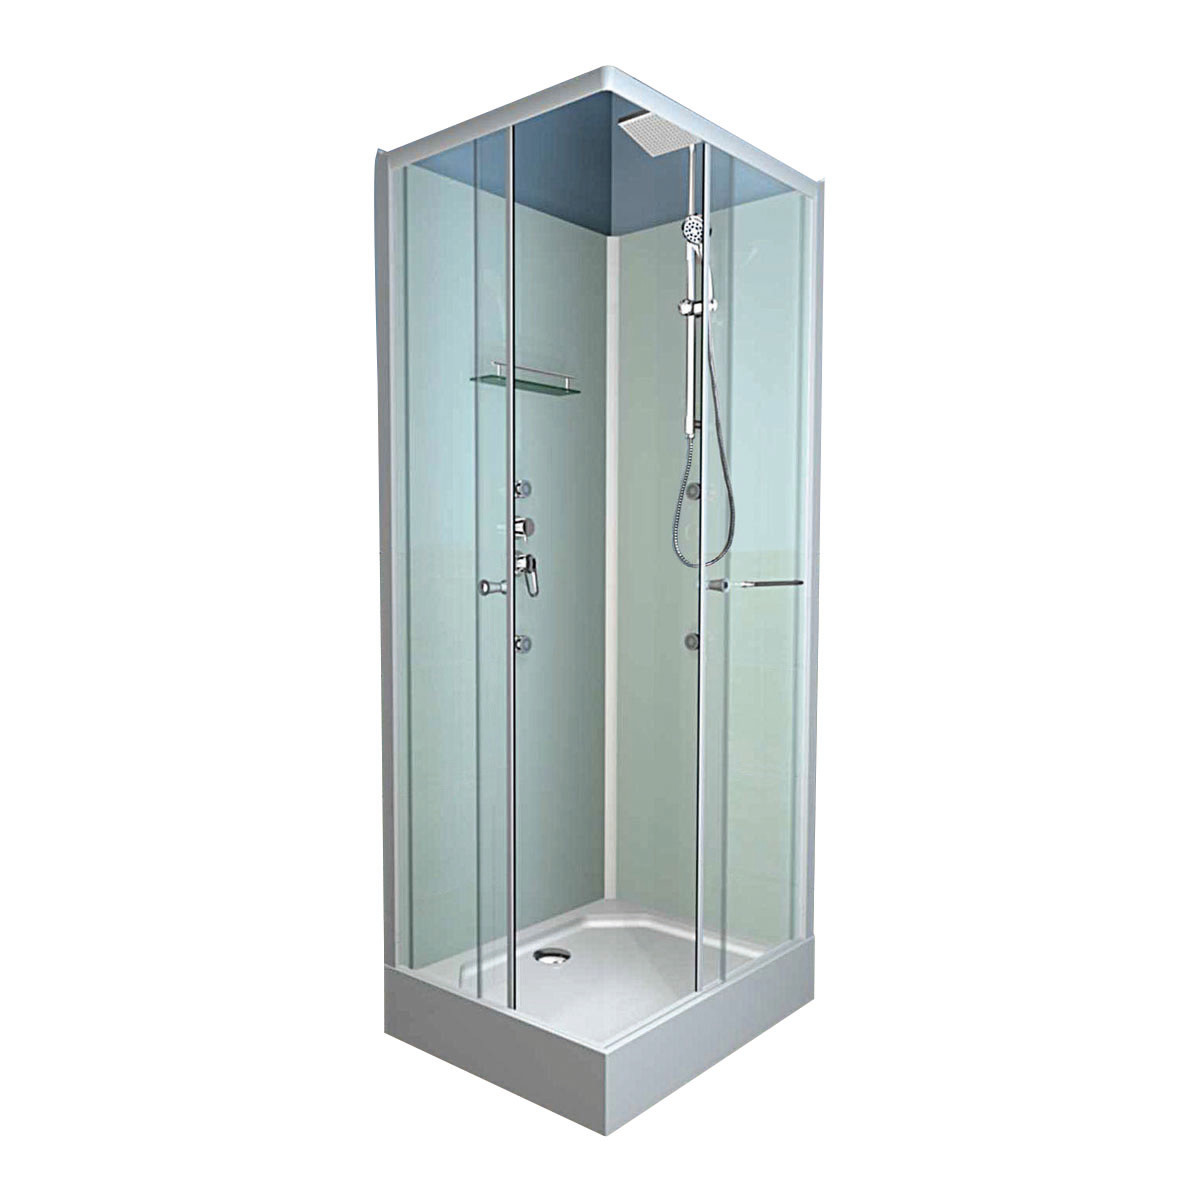 Doccia e vasca insieme 70cm for Box doccia tre lati leroy merlin